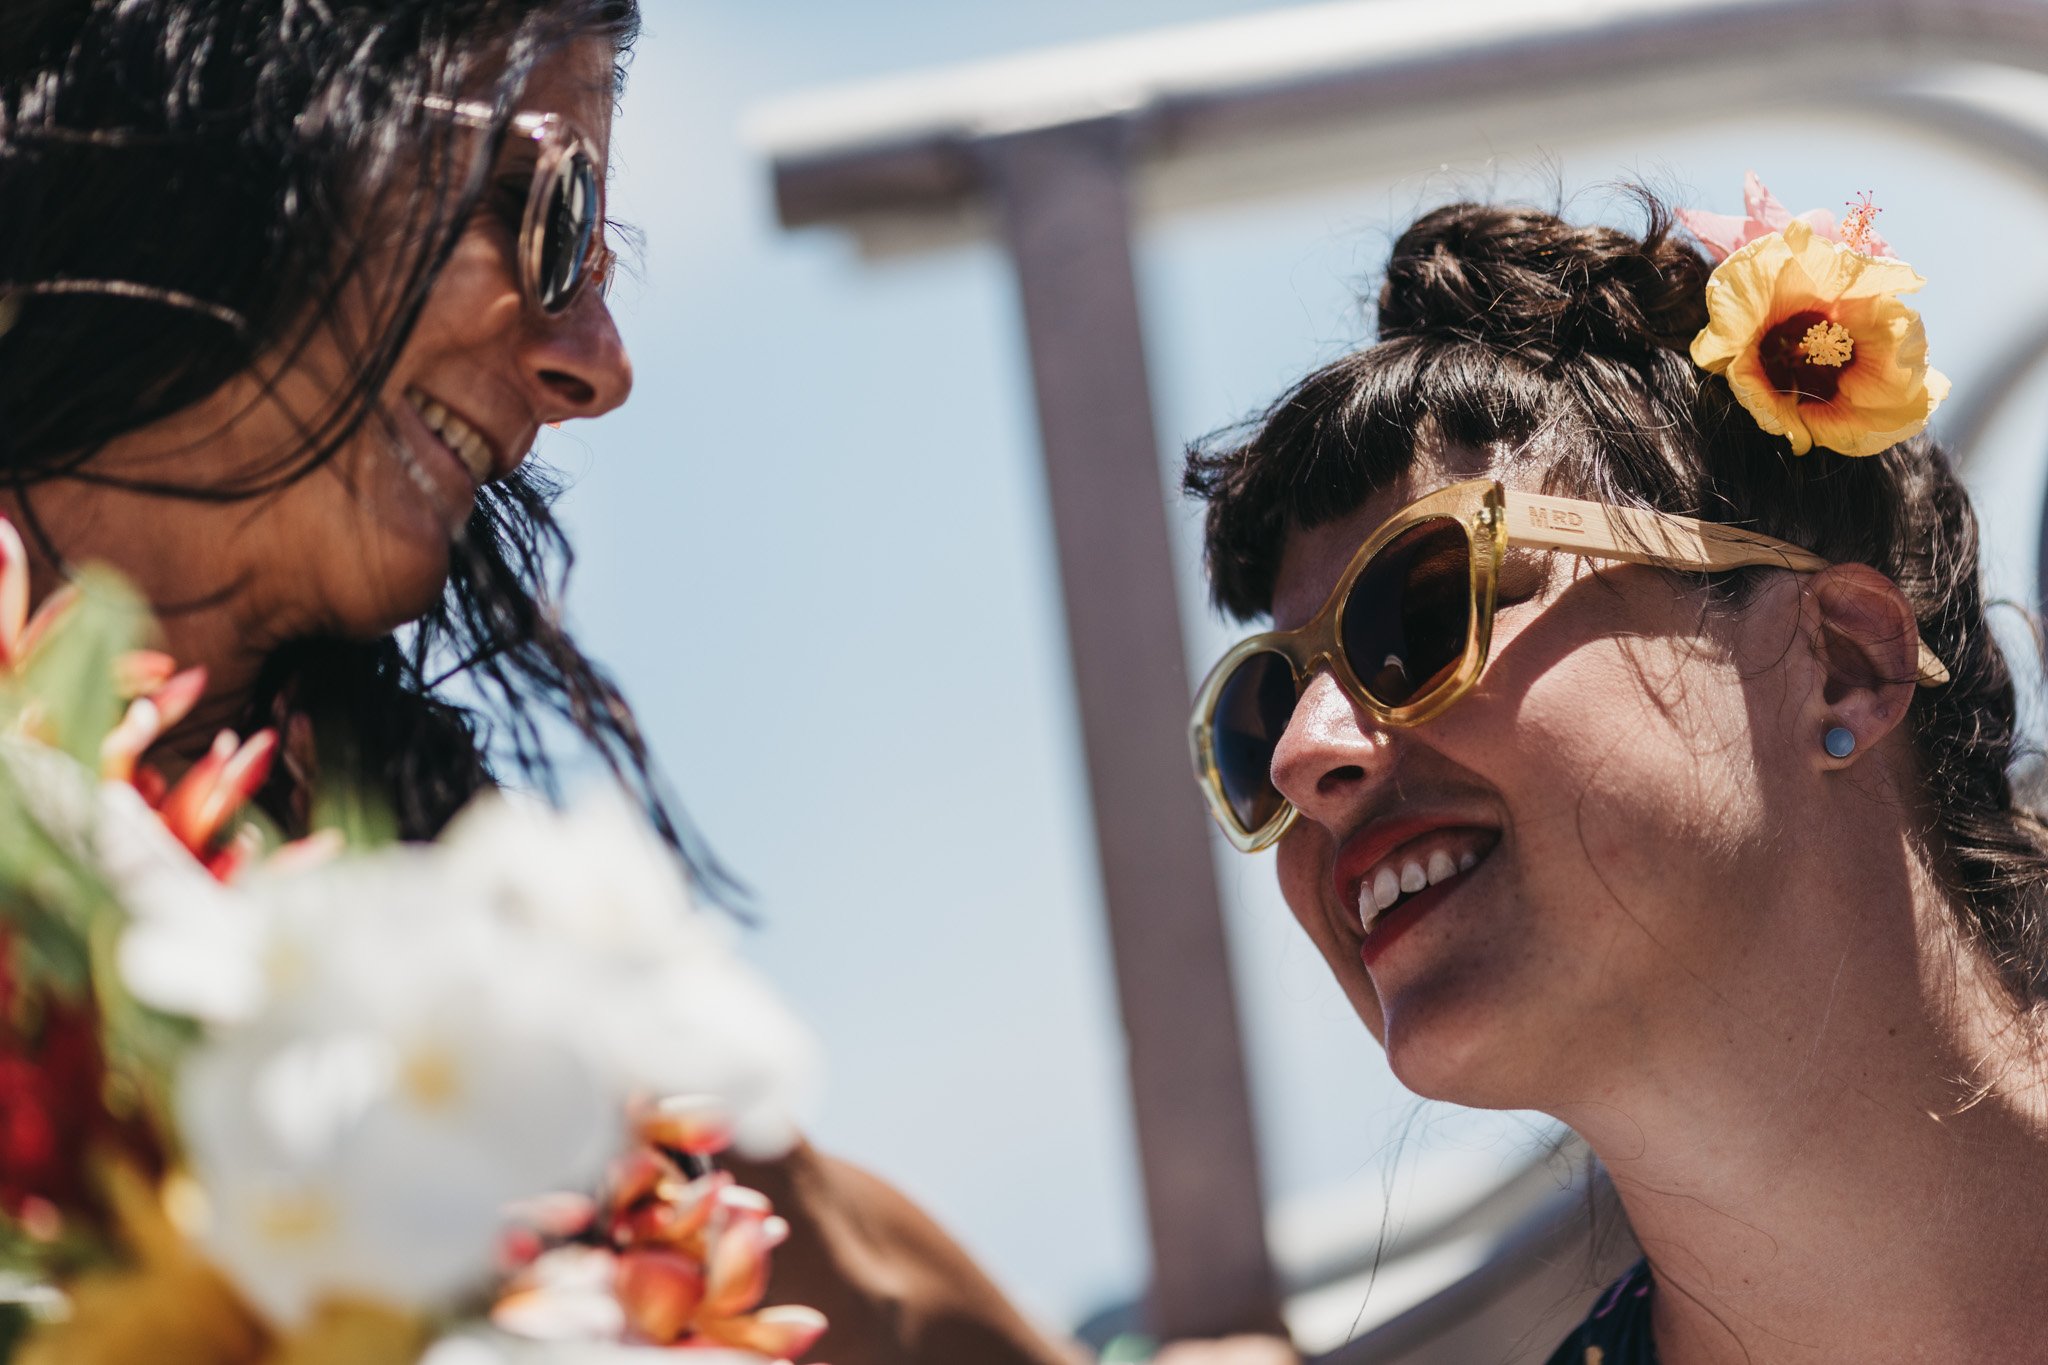 wedding-vow-renewal-hawaii-hochzeit-maui-silberhochzeit-karol-and-jens_129.jpg